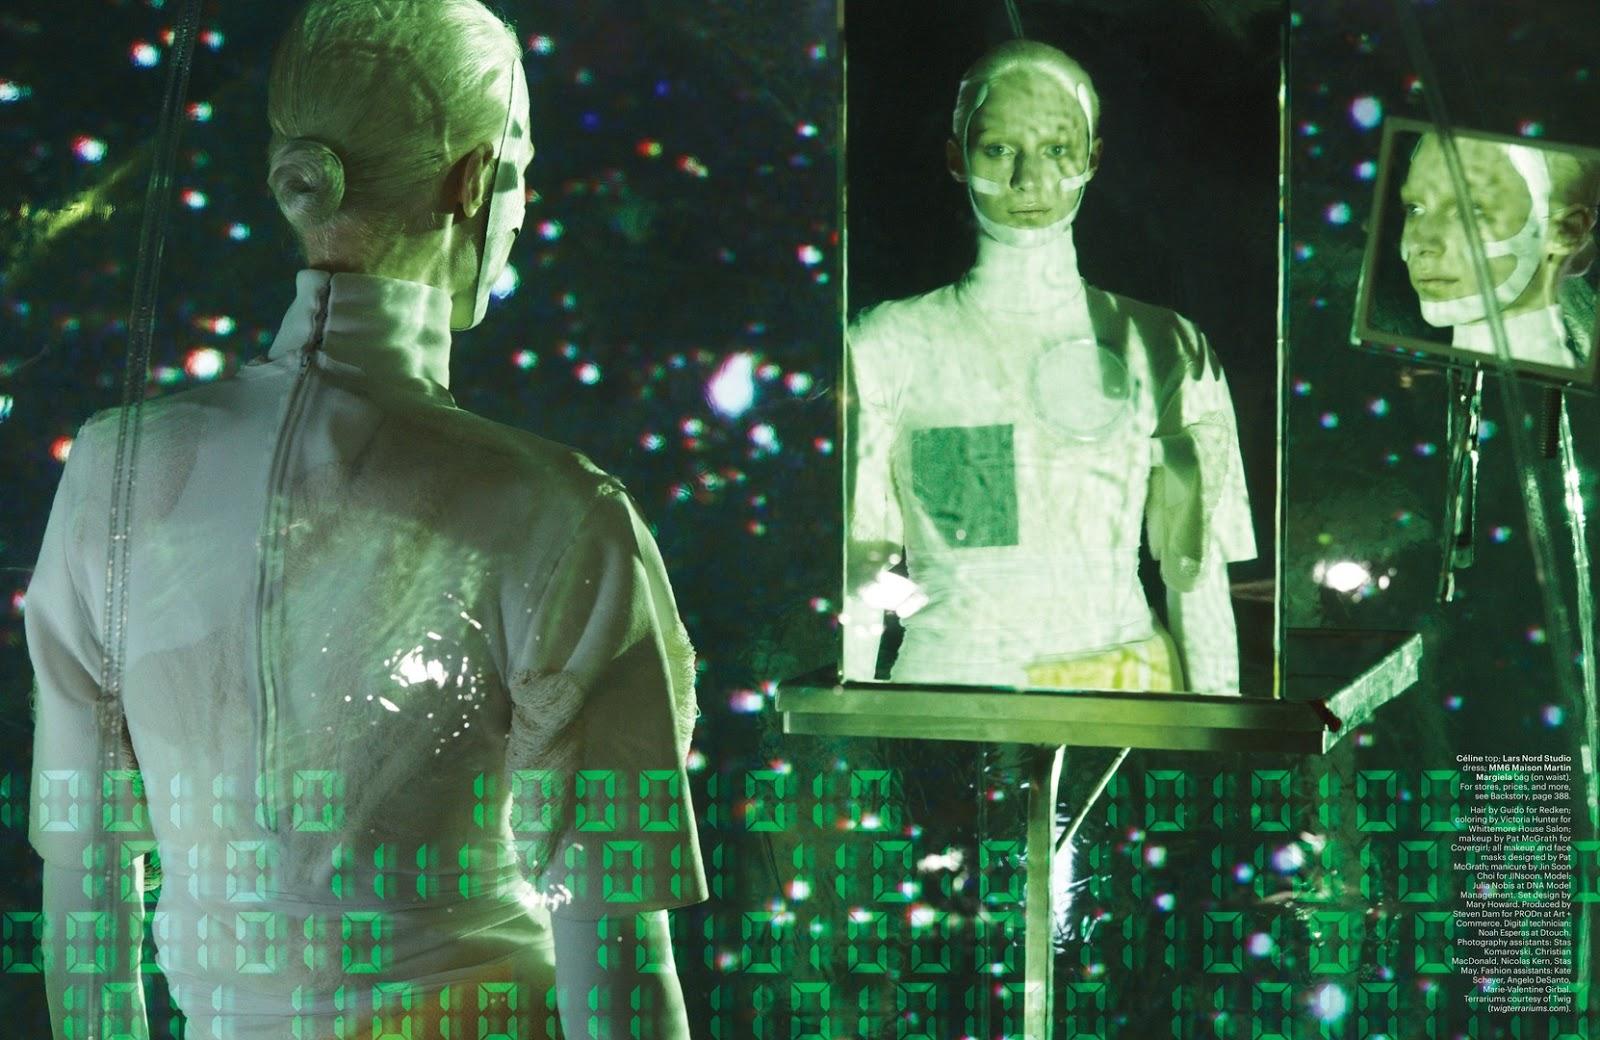 lost-in-cyber-space-3.jpg